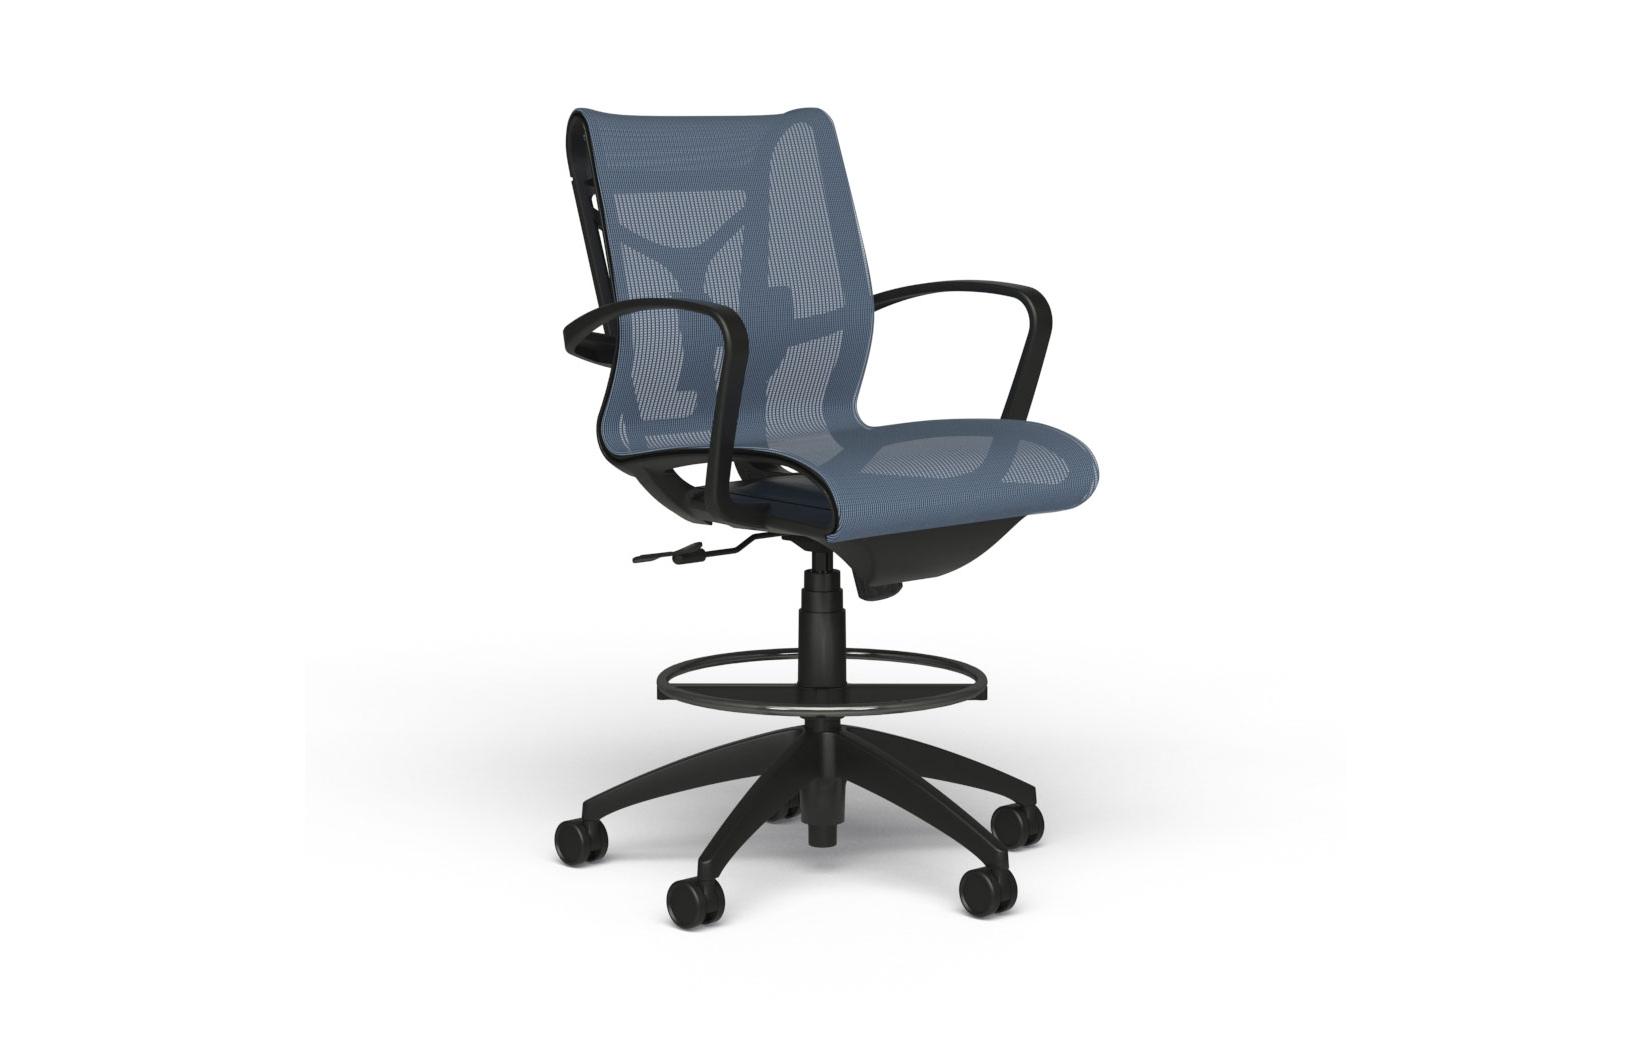 9 to 5 Seating Cydia